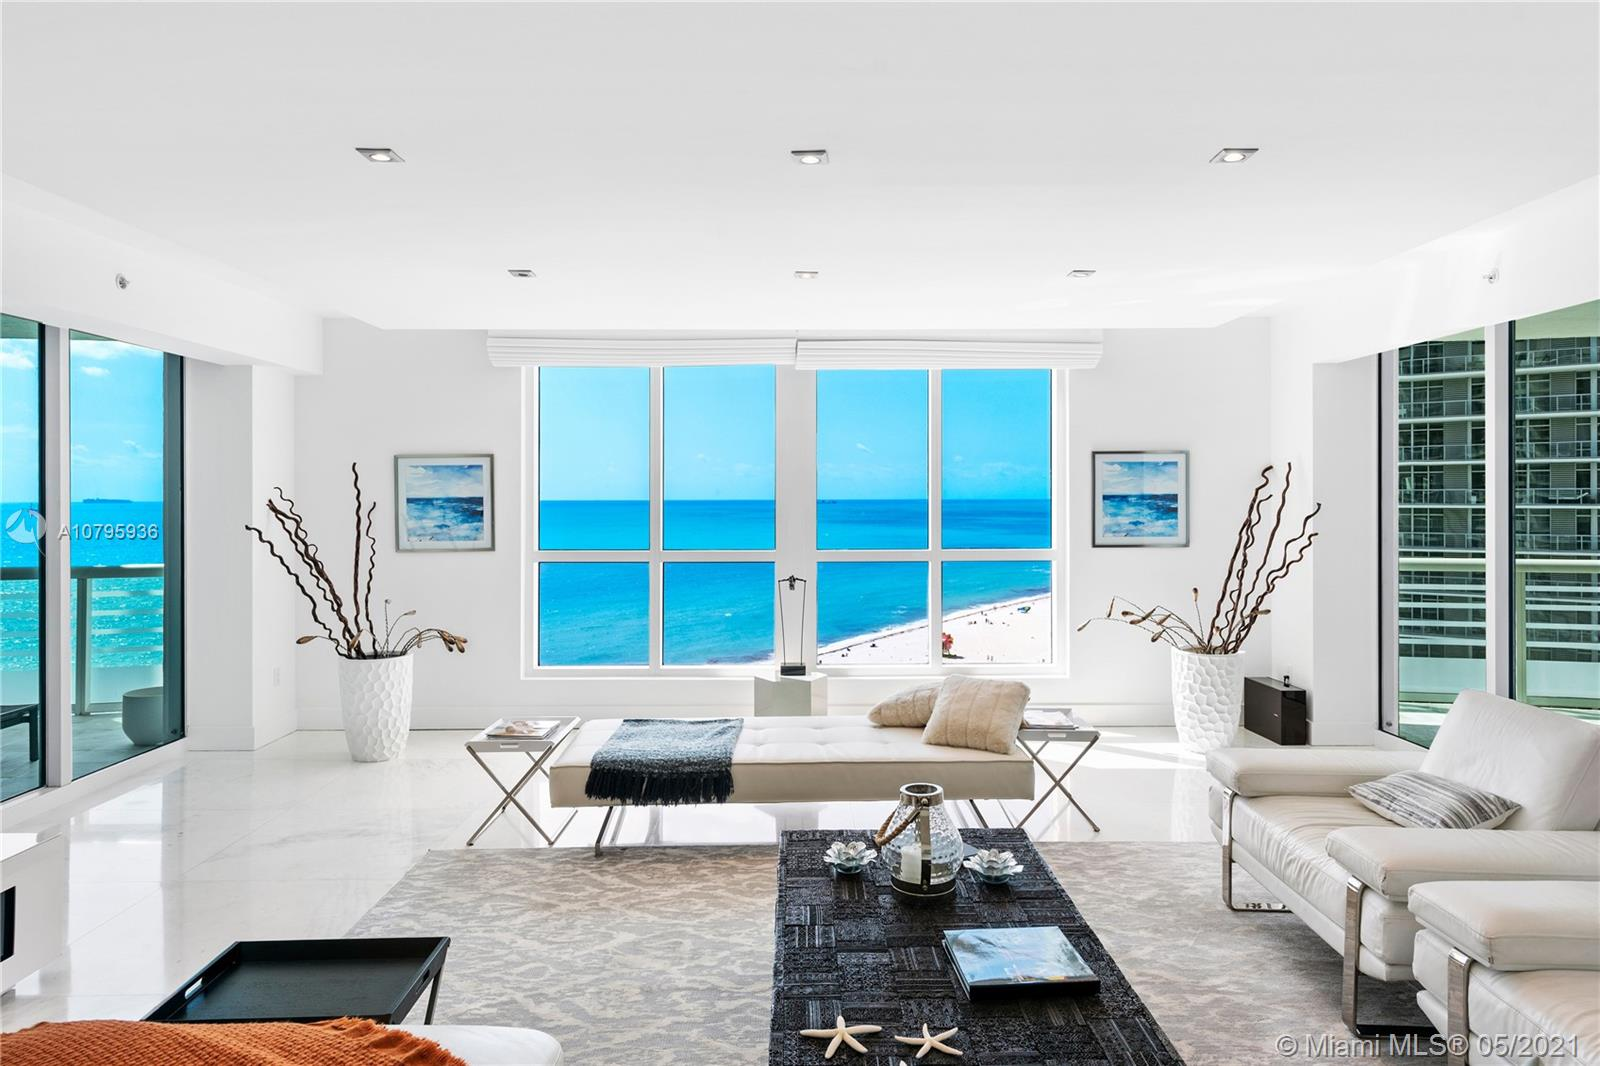 3801 Collins Ave, 1503 - Miami Beach, Florida